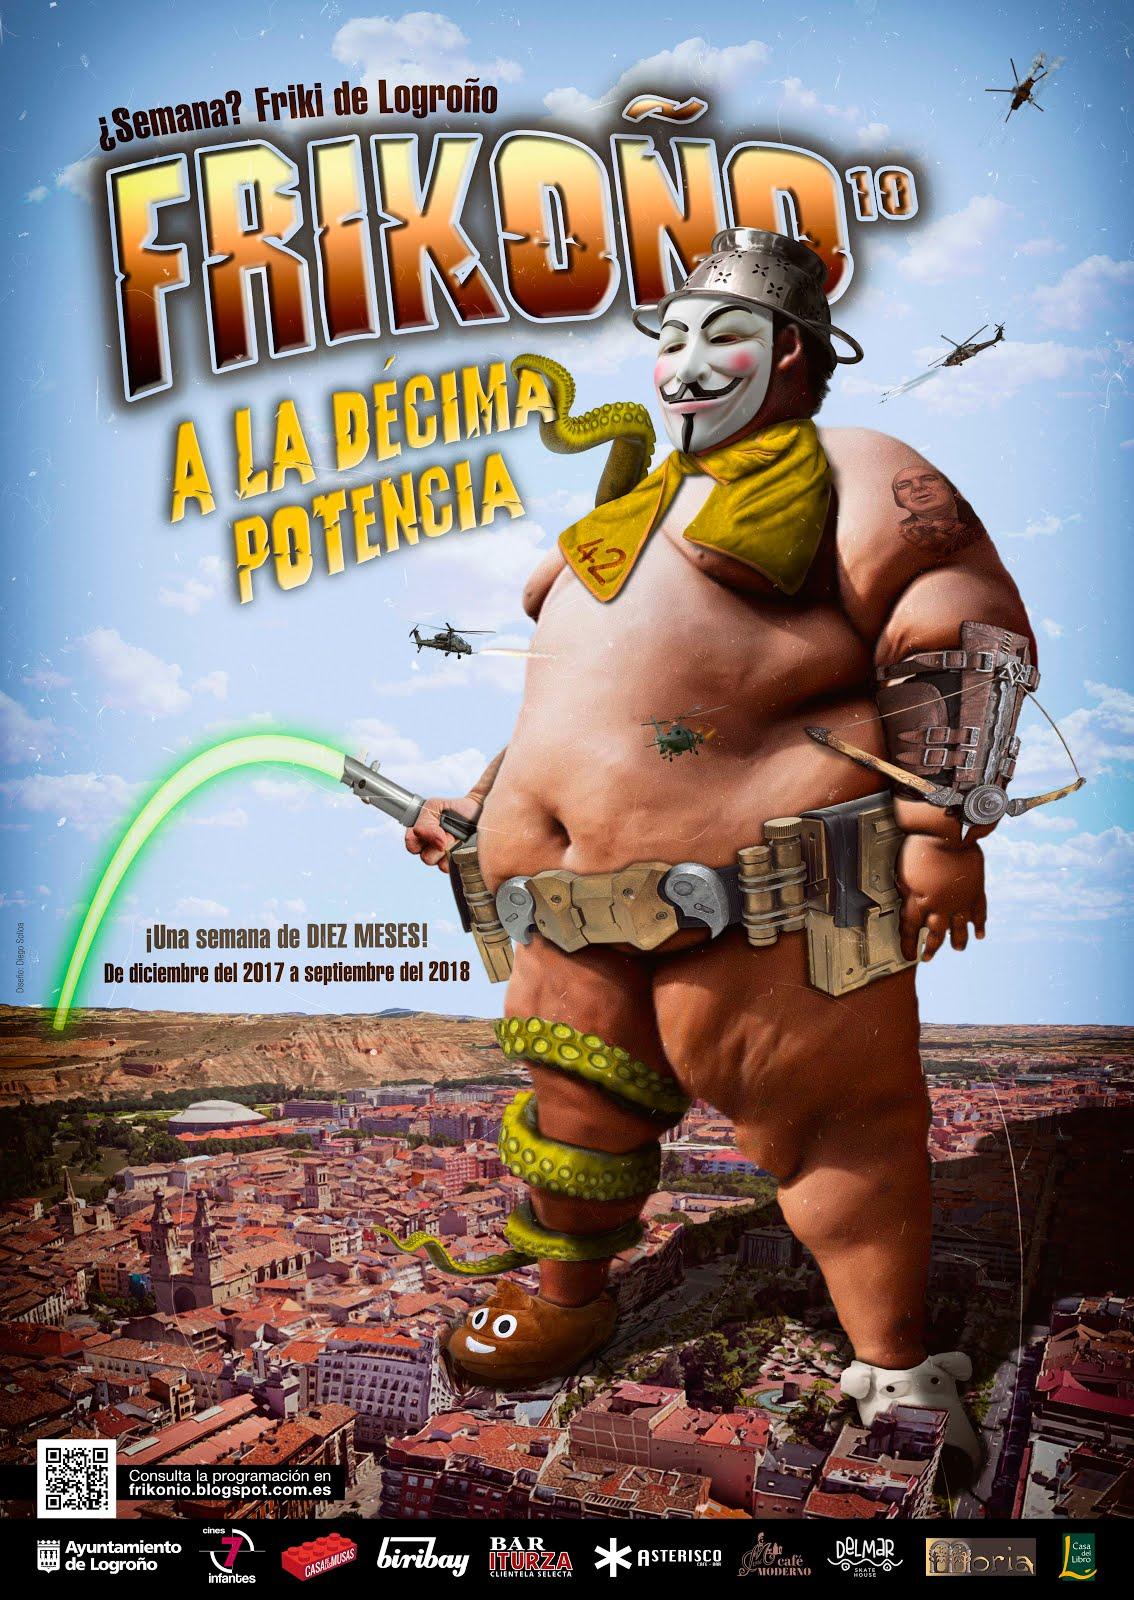 Semana Friki de Logroño